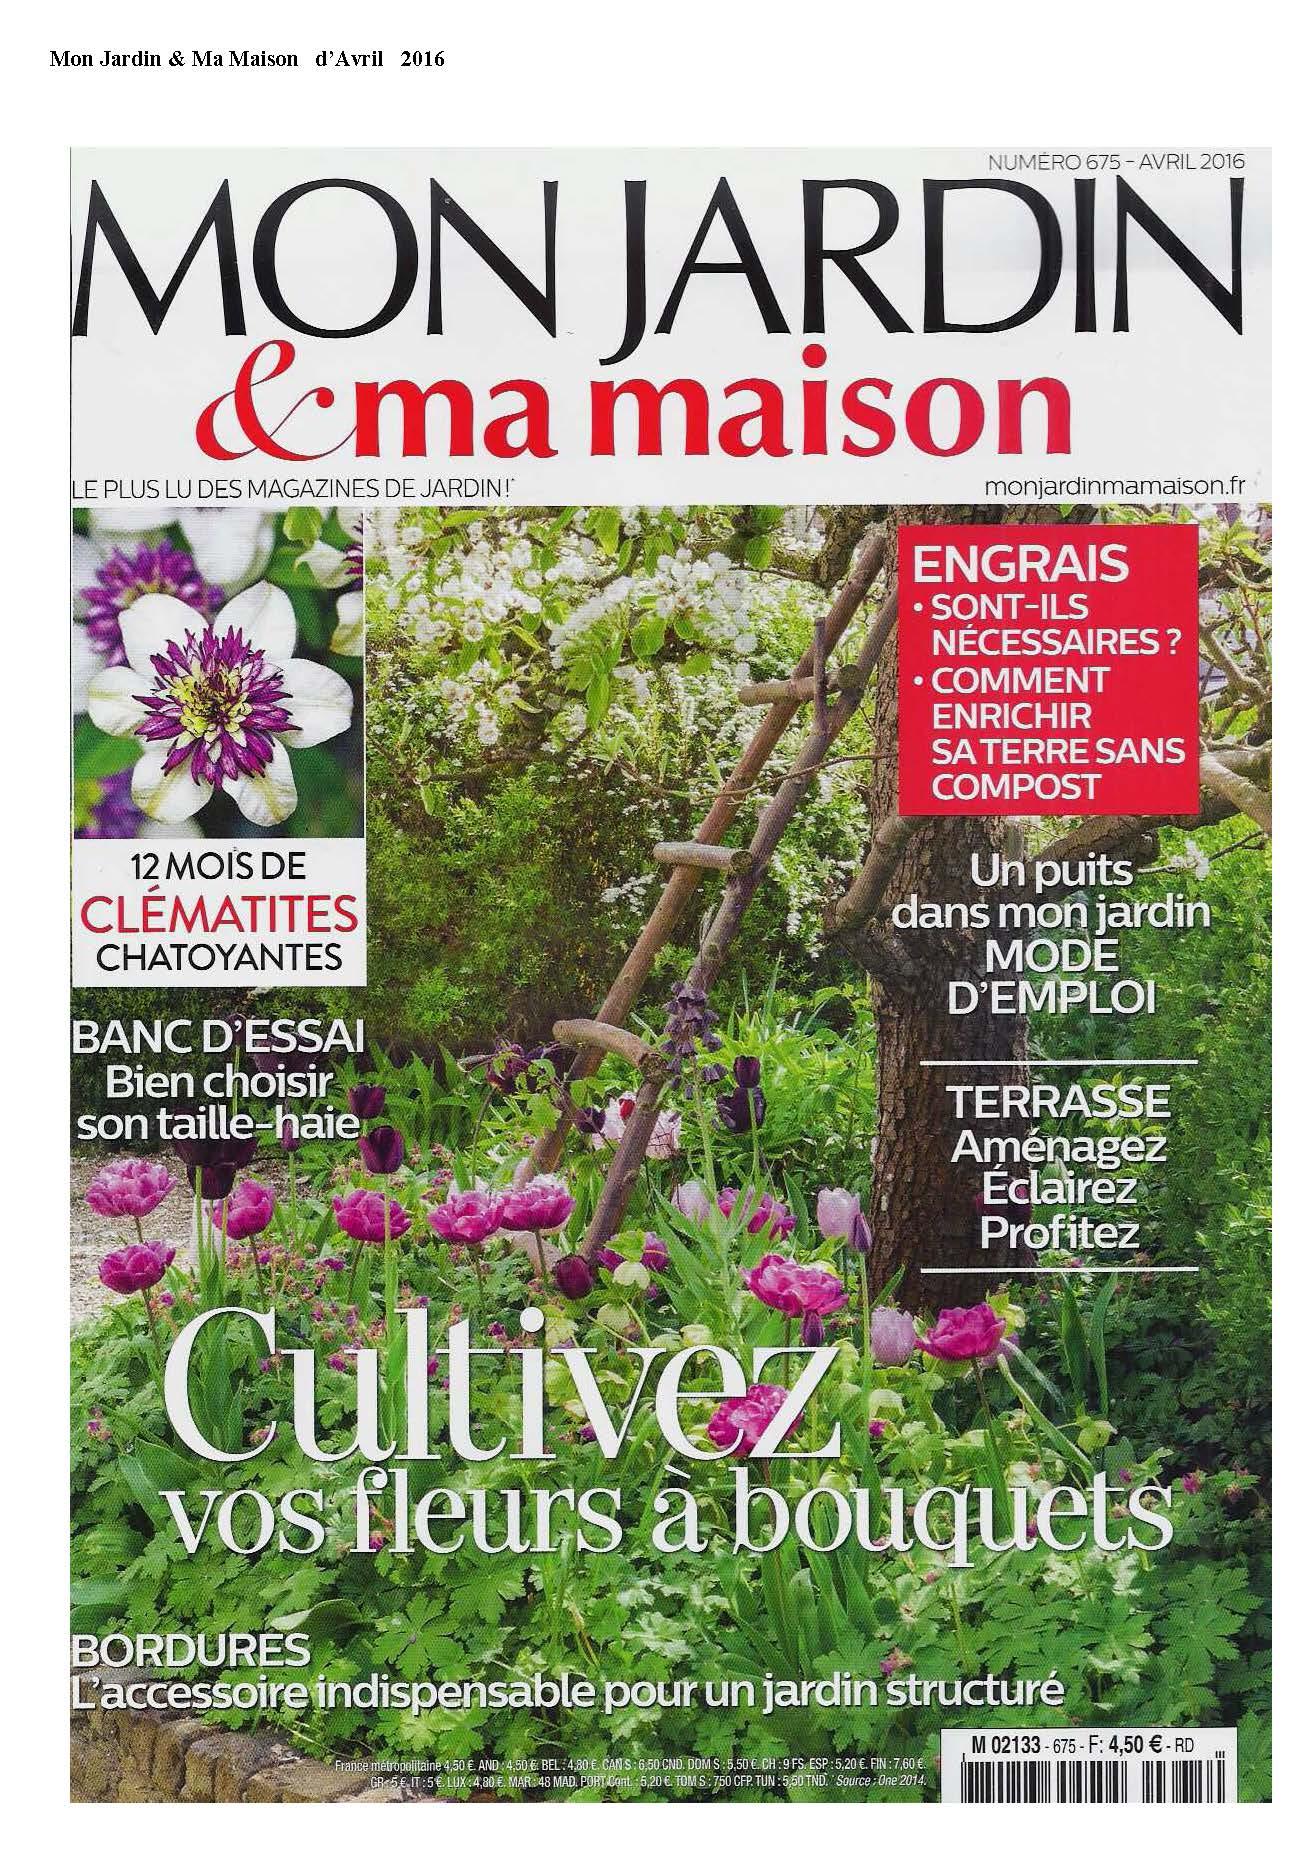 PIB en el periódico Mon jardin & ma maison Abril 2016